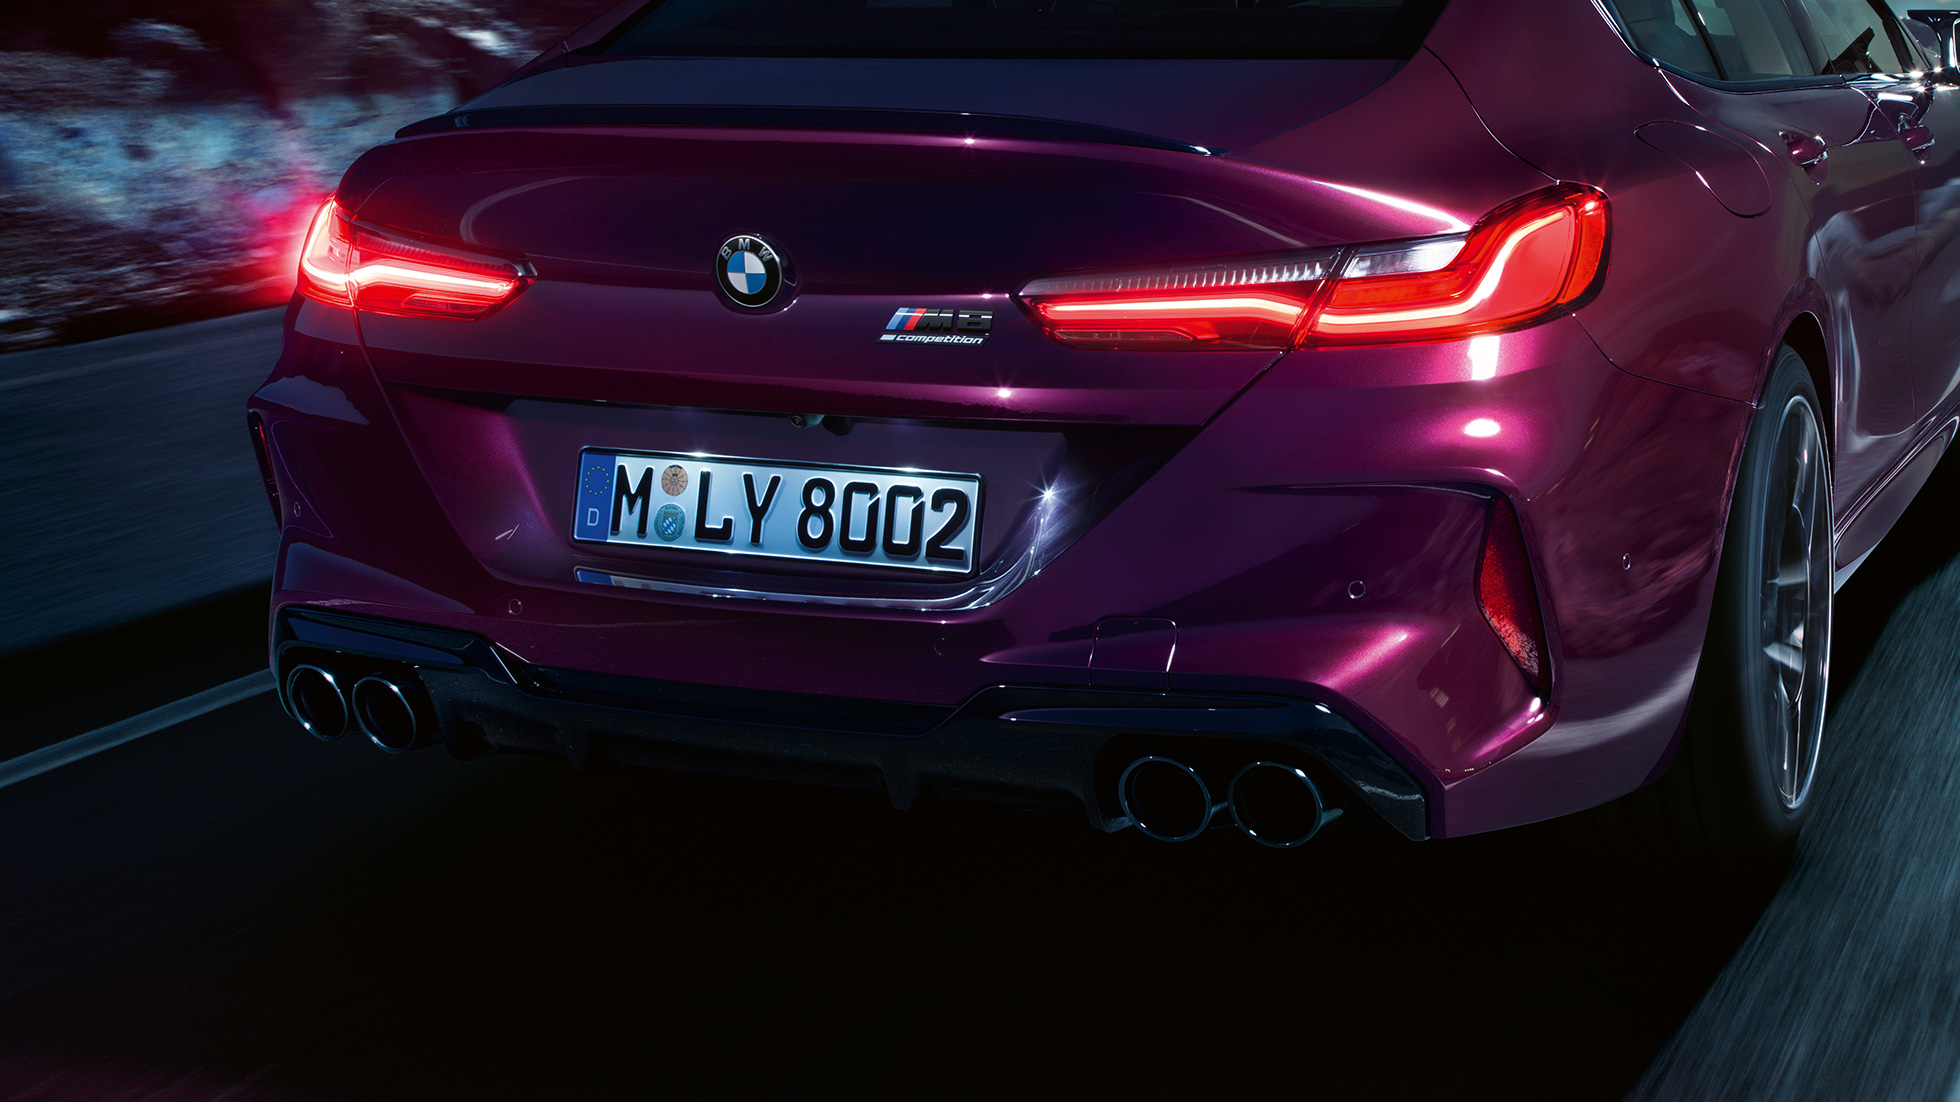 The M8 Bmw M8 Competition Gran Coupe Destaques